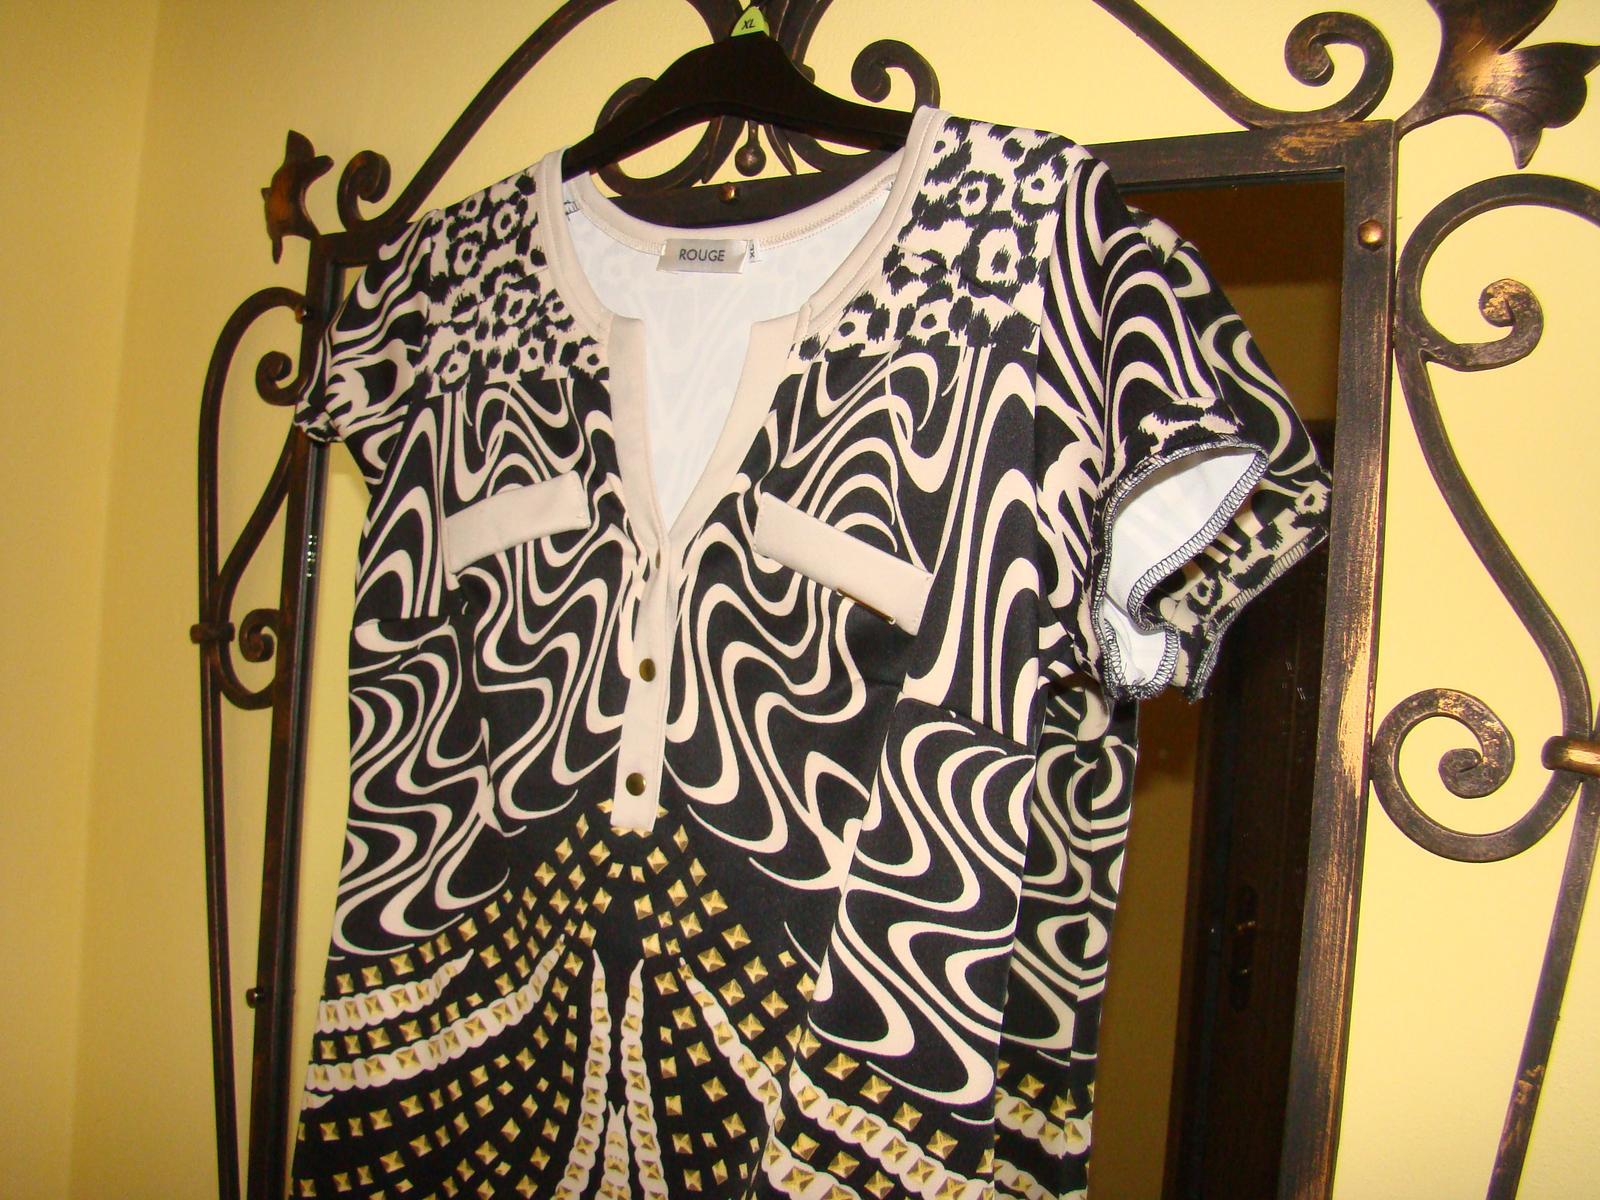 Nenosene Rouge šaty do spoločnosti - Obrázok č. 2